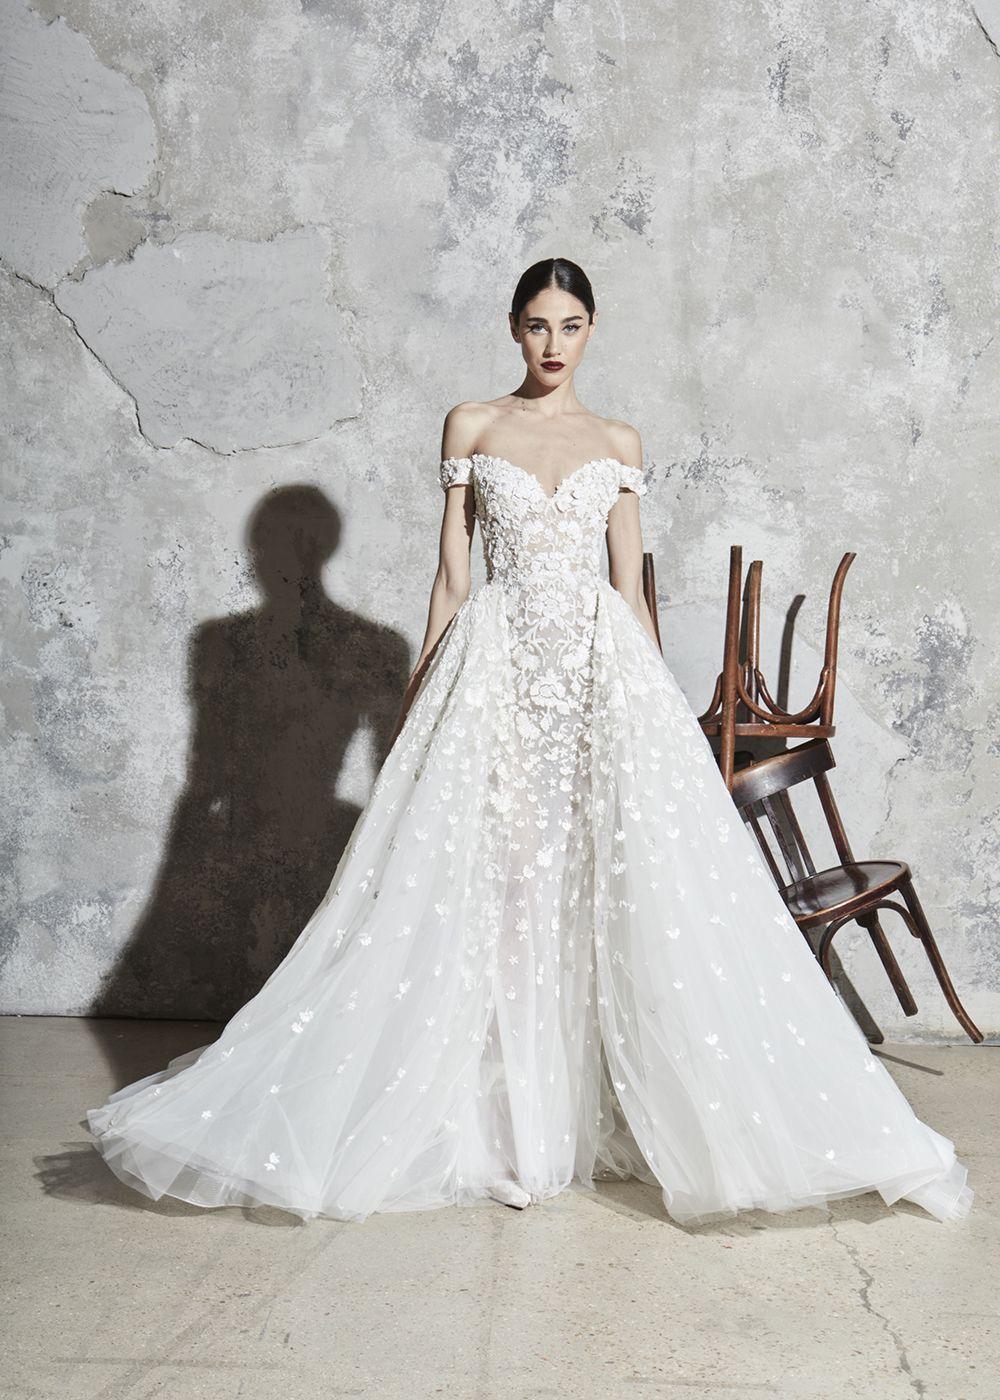 Pin By Esposa Group On Esposa Prive Bridal 2020 Zuhair Murad Bridal Black Lace Bridesmaid Dress Winter Wedding Outfits [ 1400 x 1000 Pixel ]